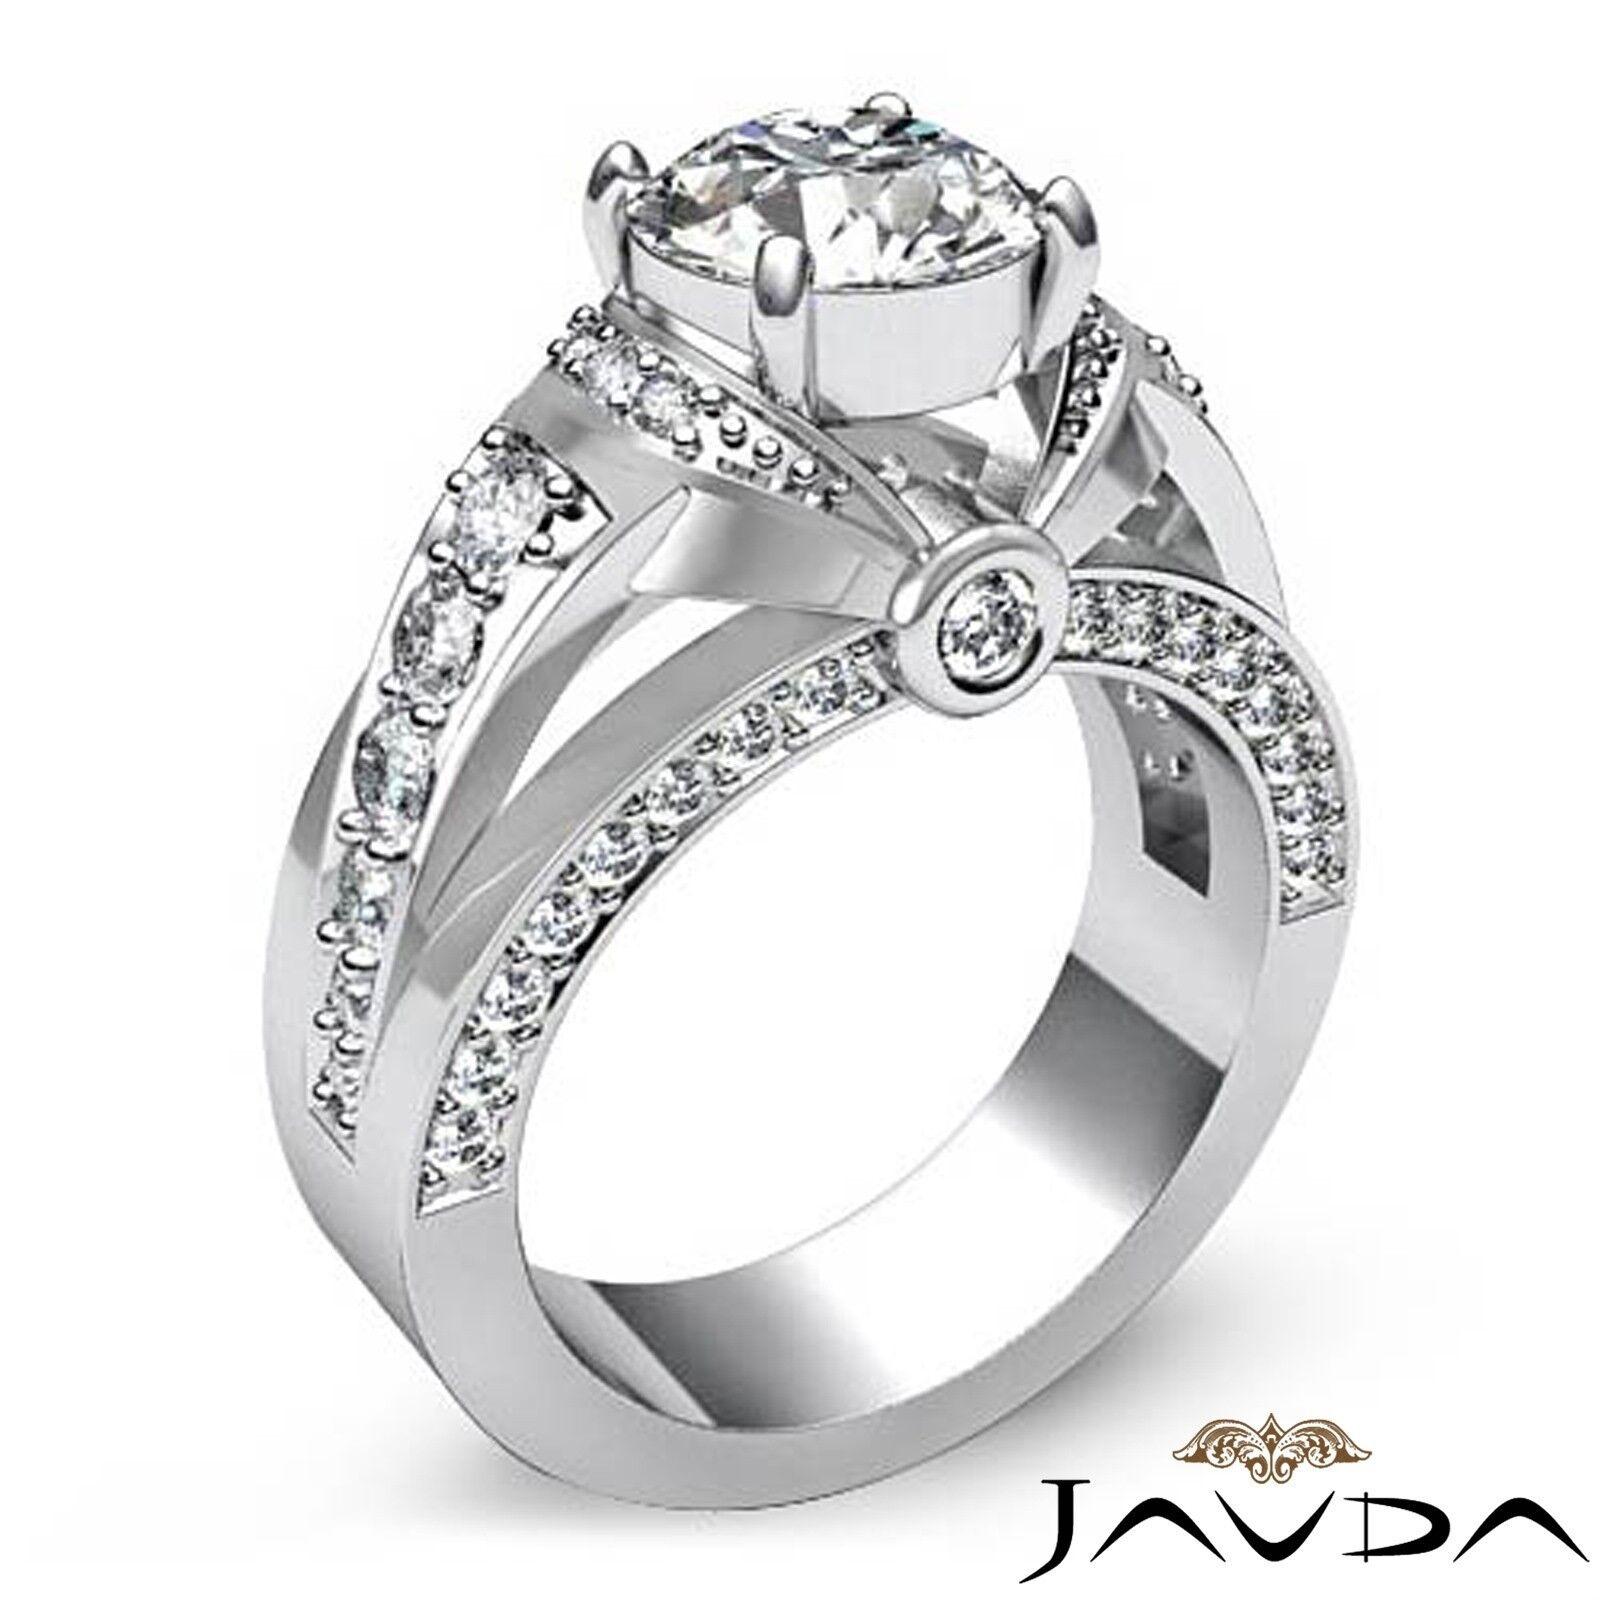 1.7ct Knot Classic Sidestone Round Diamond Engagement Ring GIA H-VVS2 White Gold 1